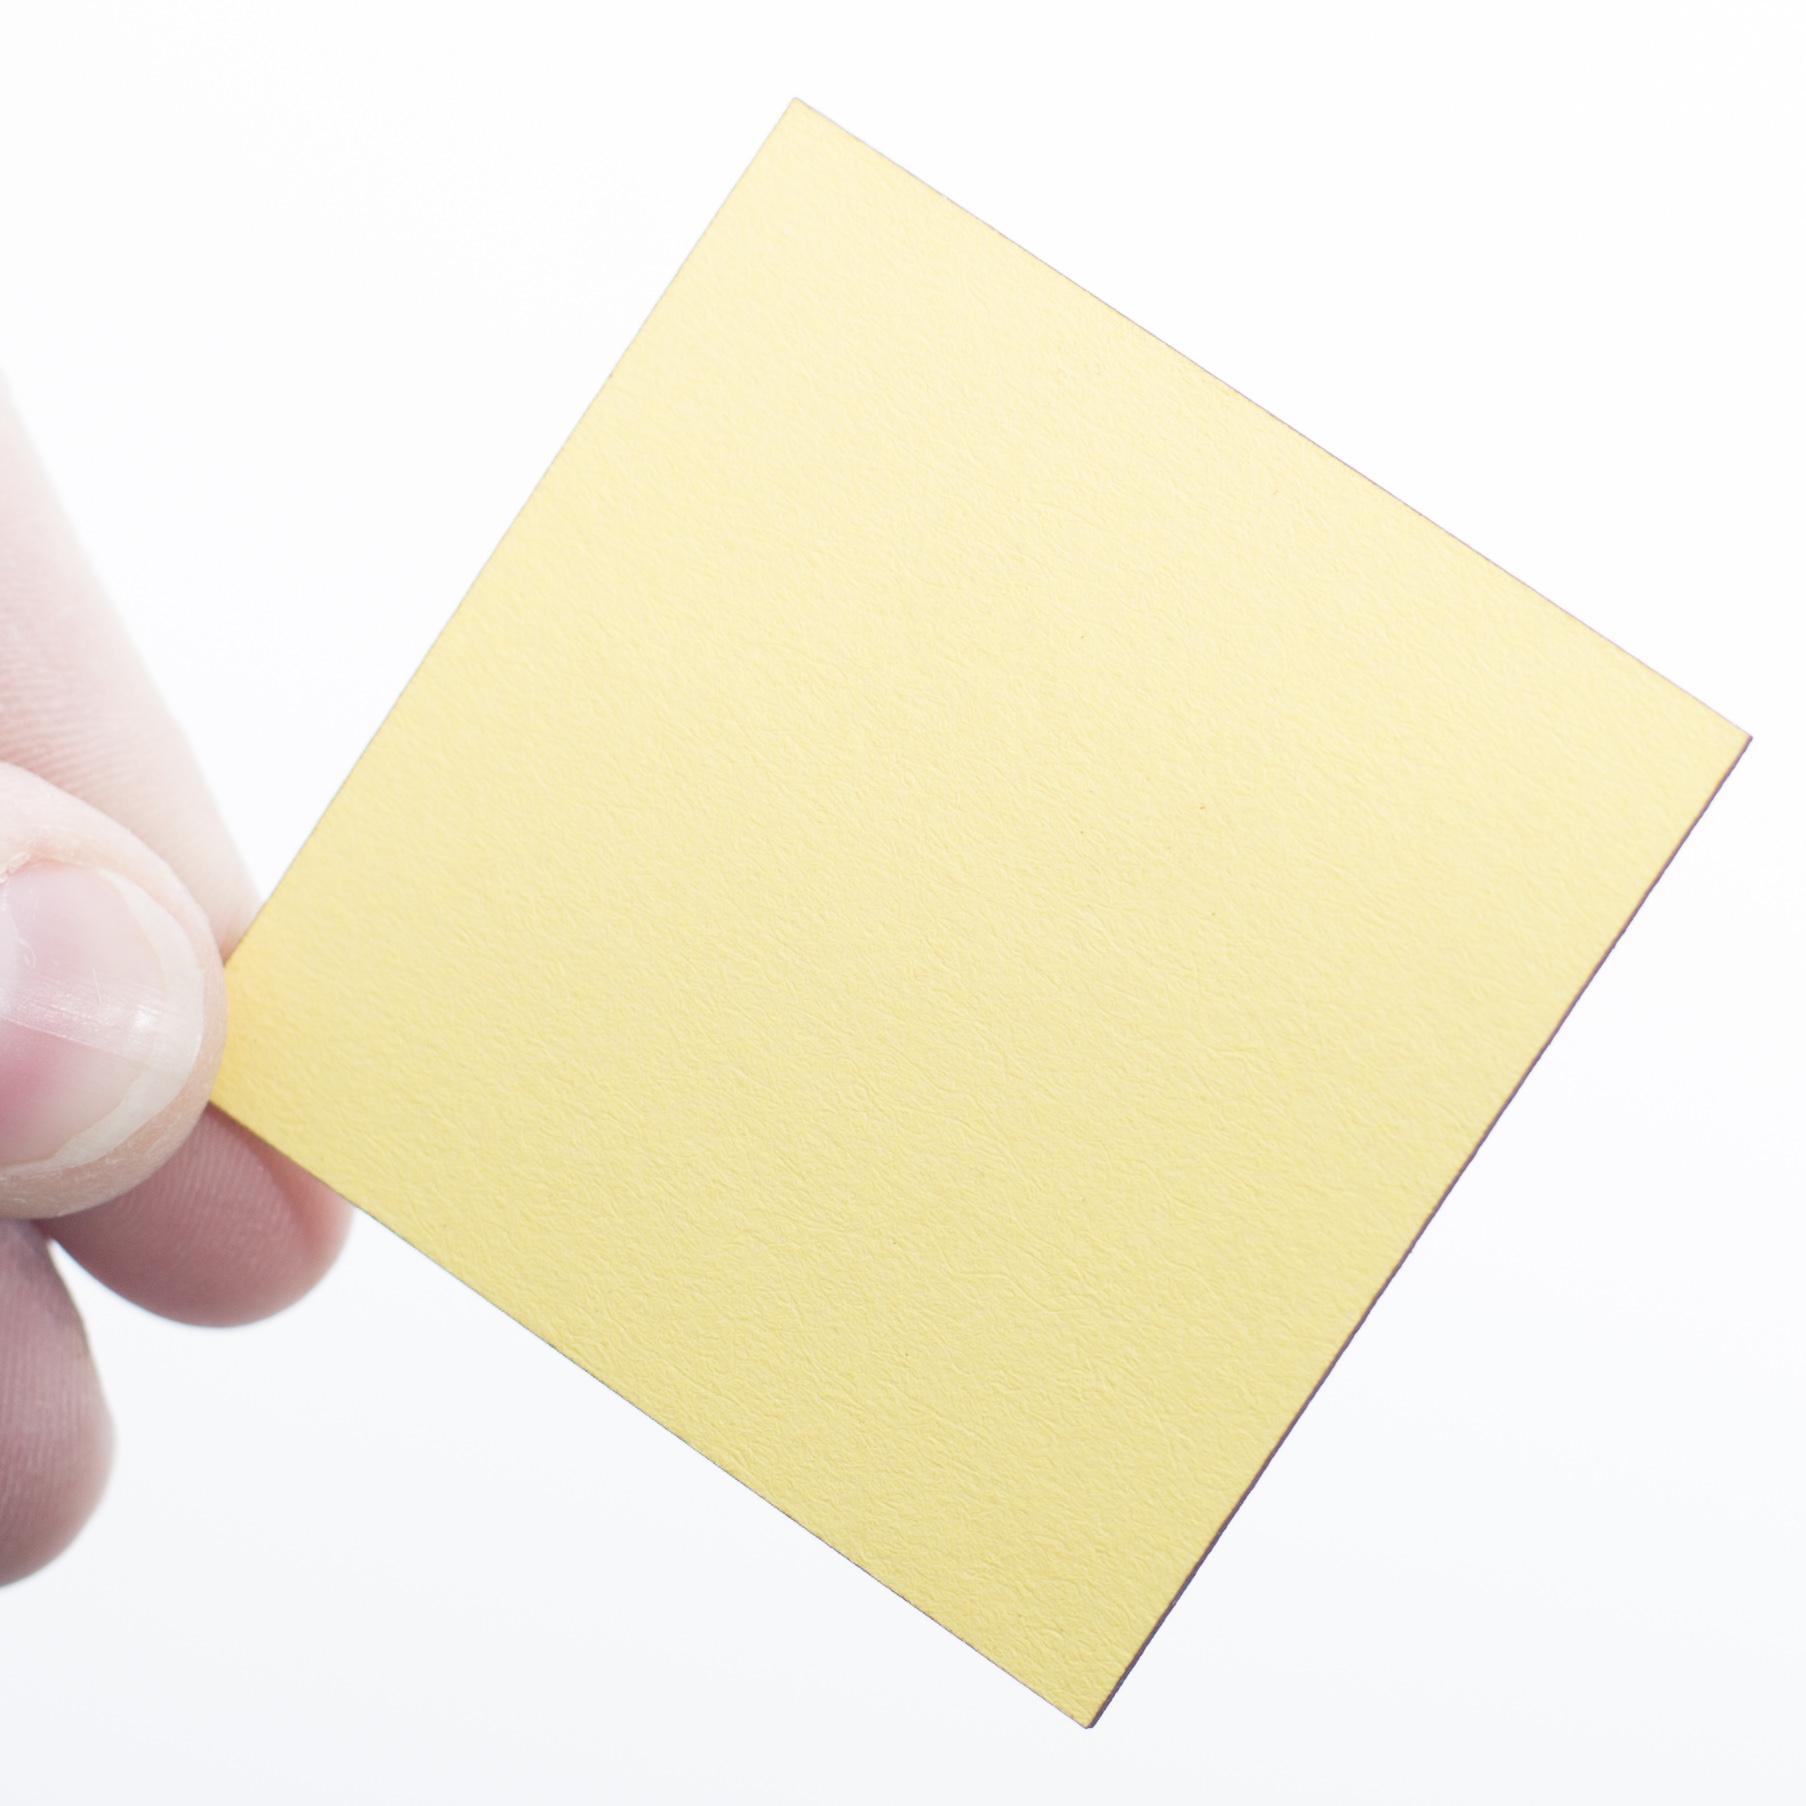 YellowMatBoard.jpg